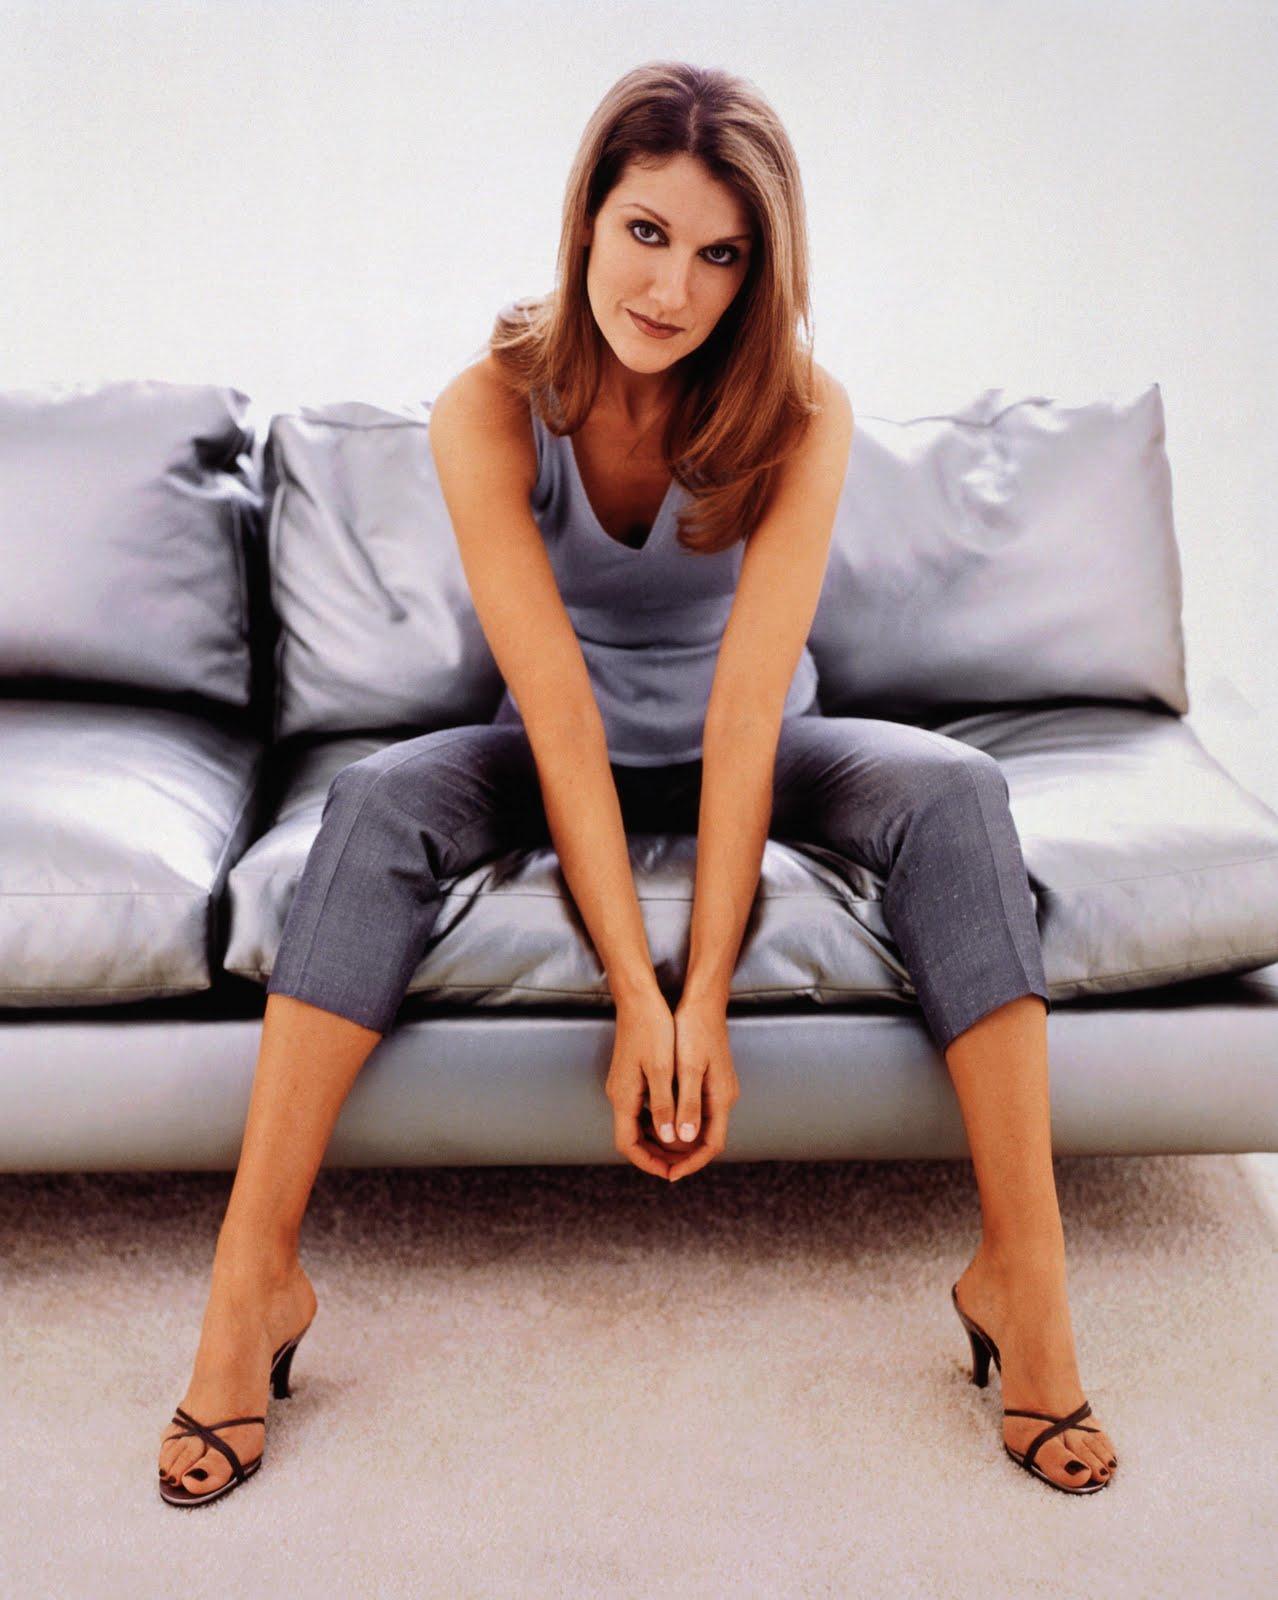 feet-pies4: Celine Dion